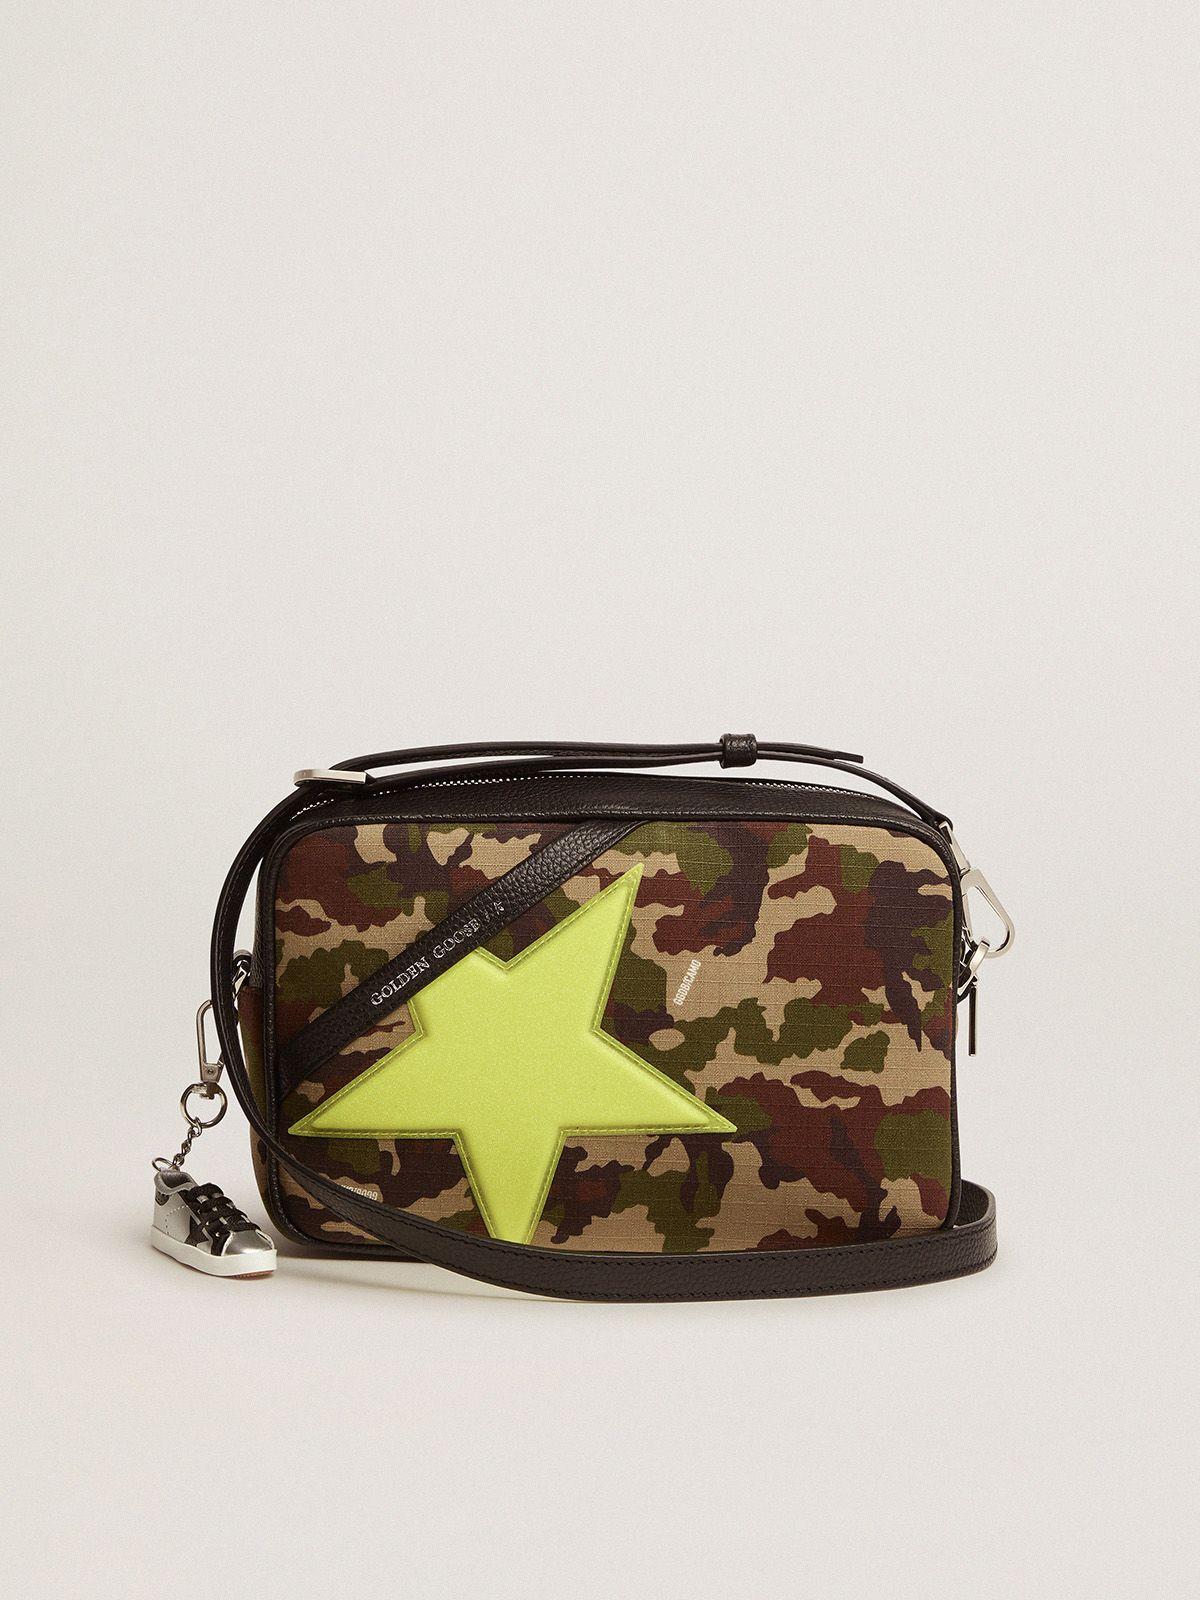 Camouflage-print Star Bag, fluorescent yellow Golden Goose star with fine iridescent glitter